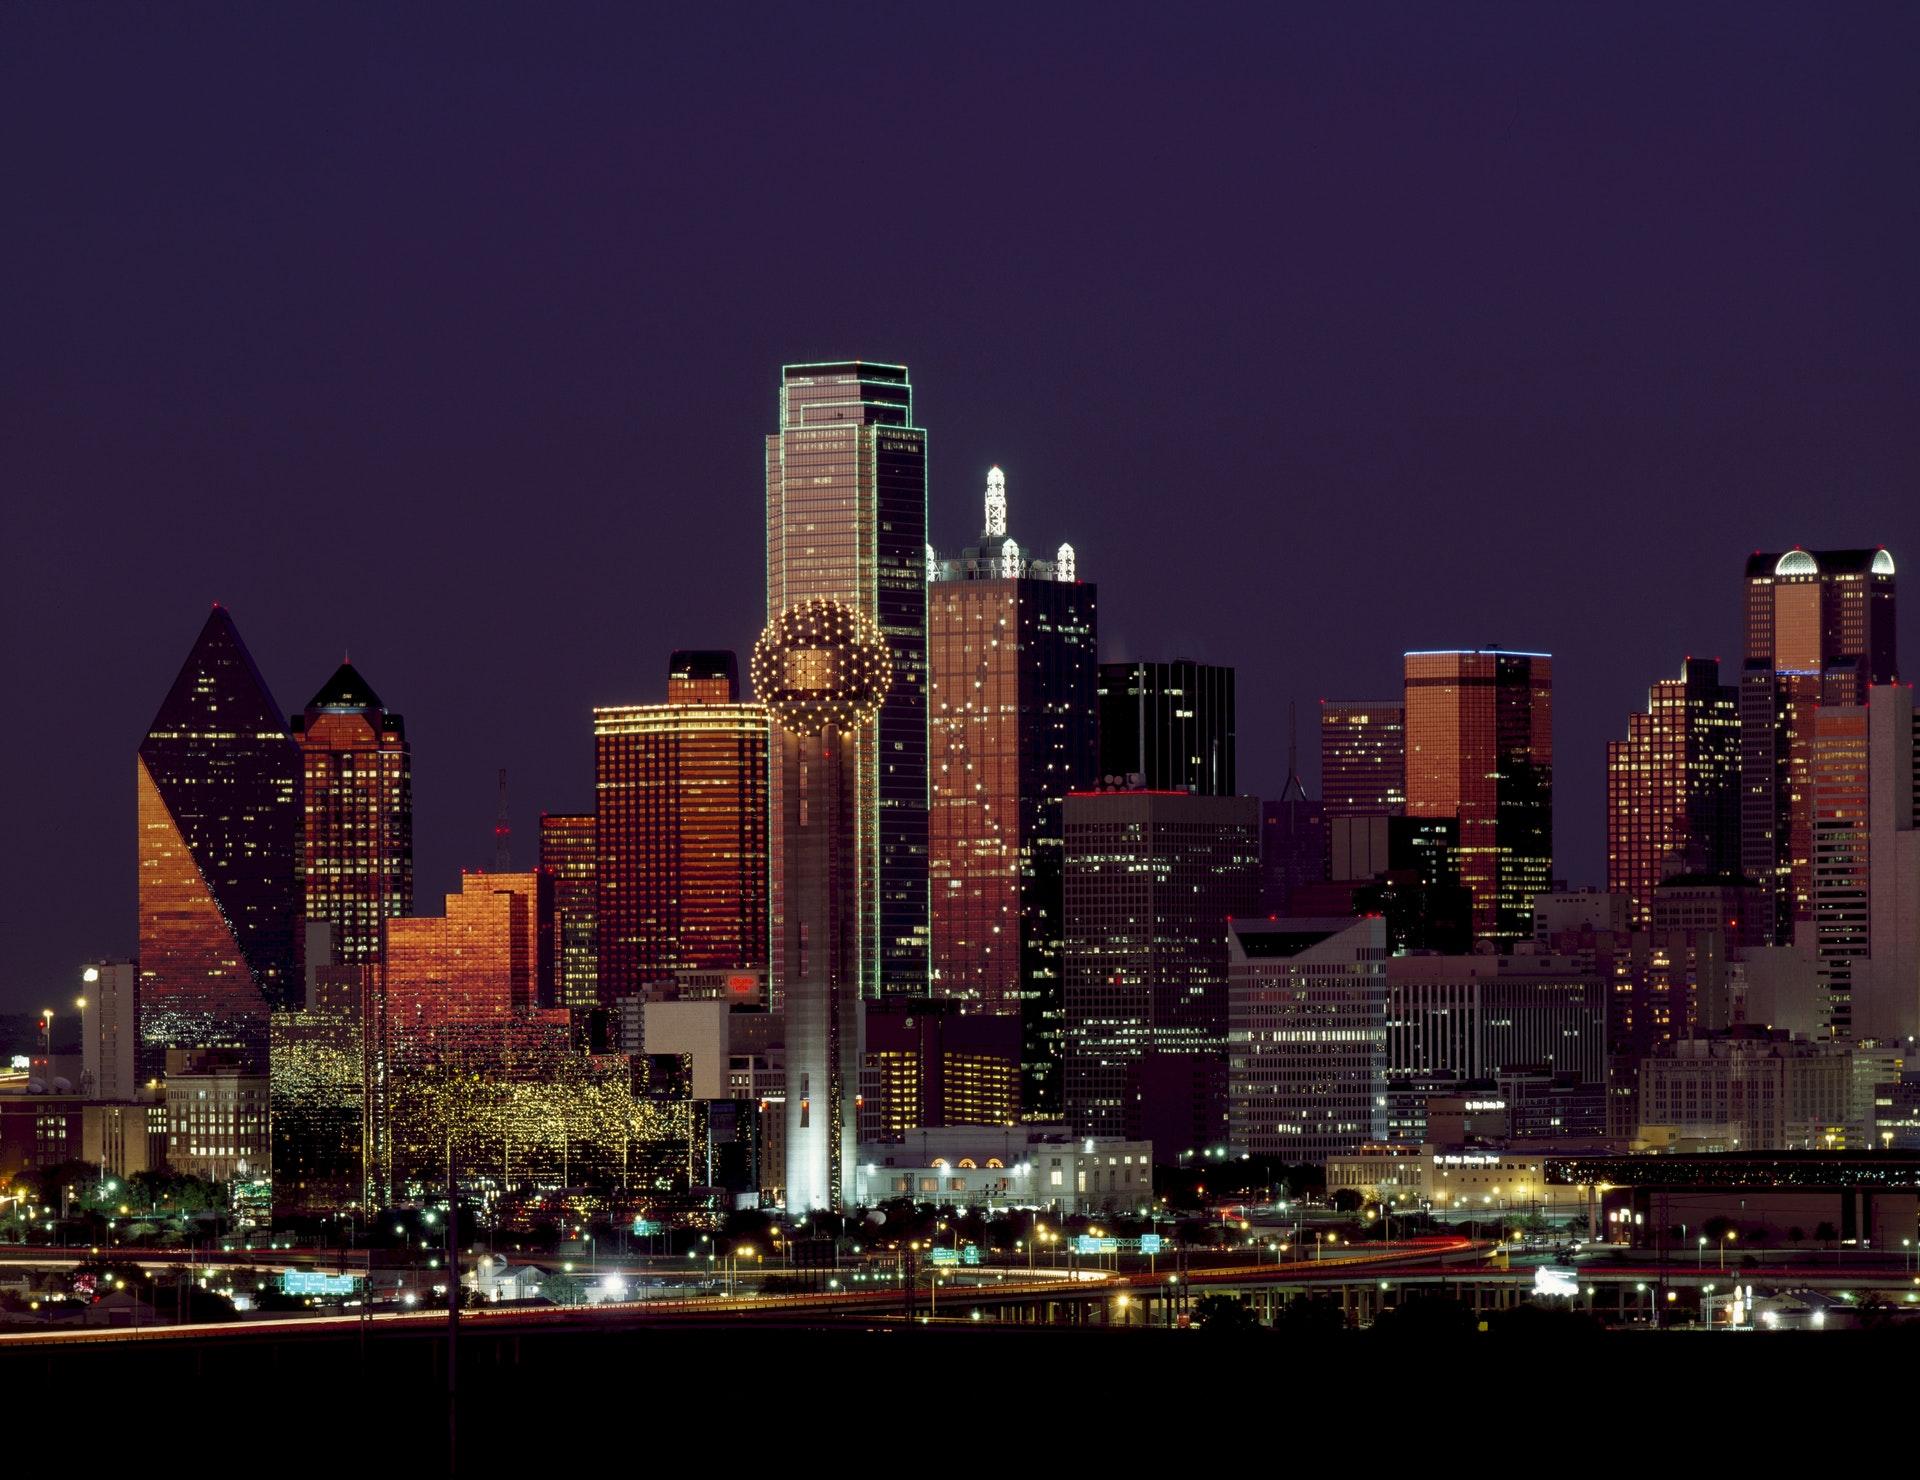 landscape-lights-skyline-buildings-45182 (1)